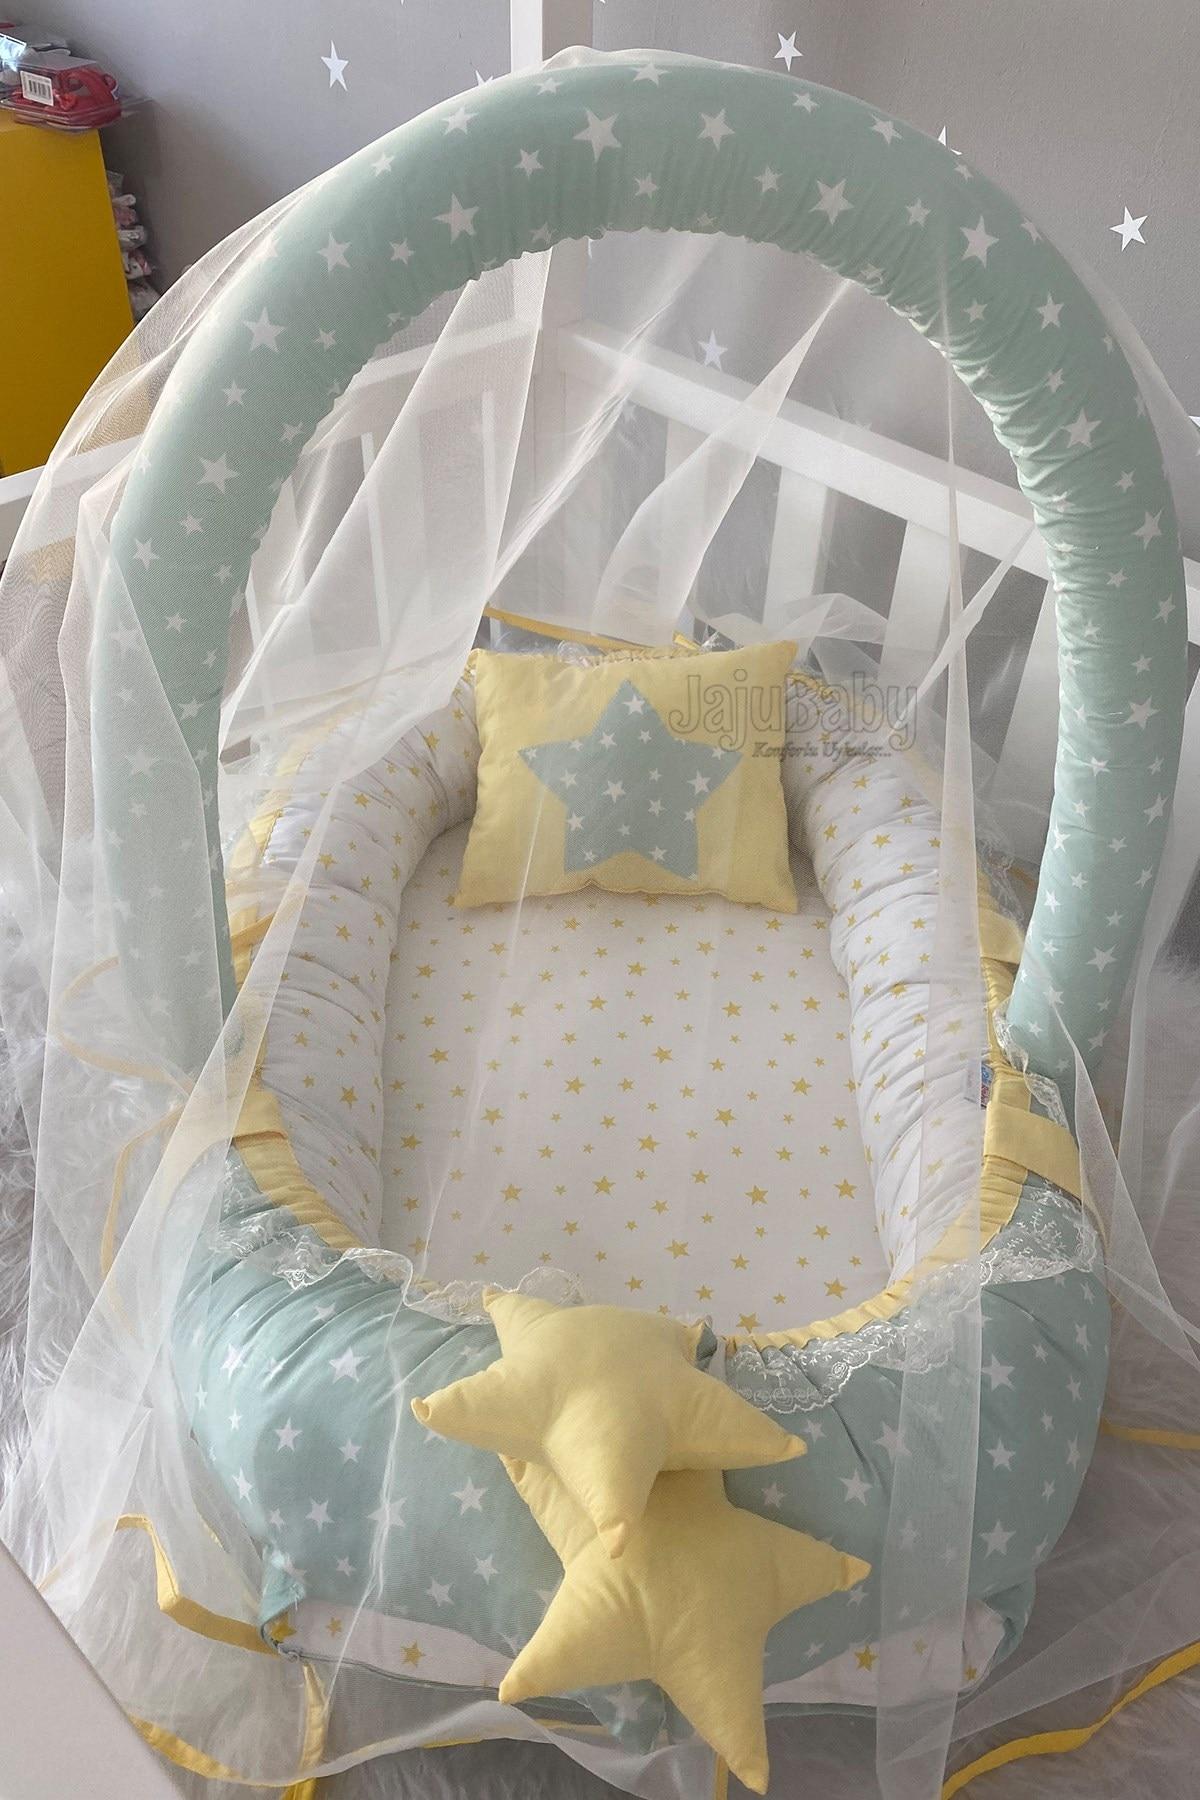 Jaju Baby Handmade Green Star Mosquito Net and Toy Hanger Luxury Design Babynest